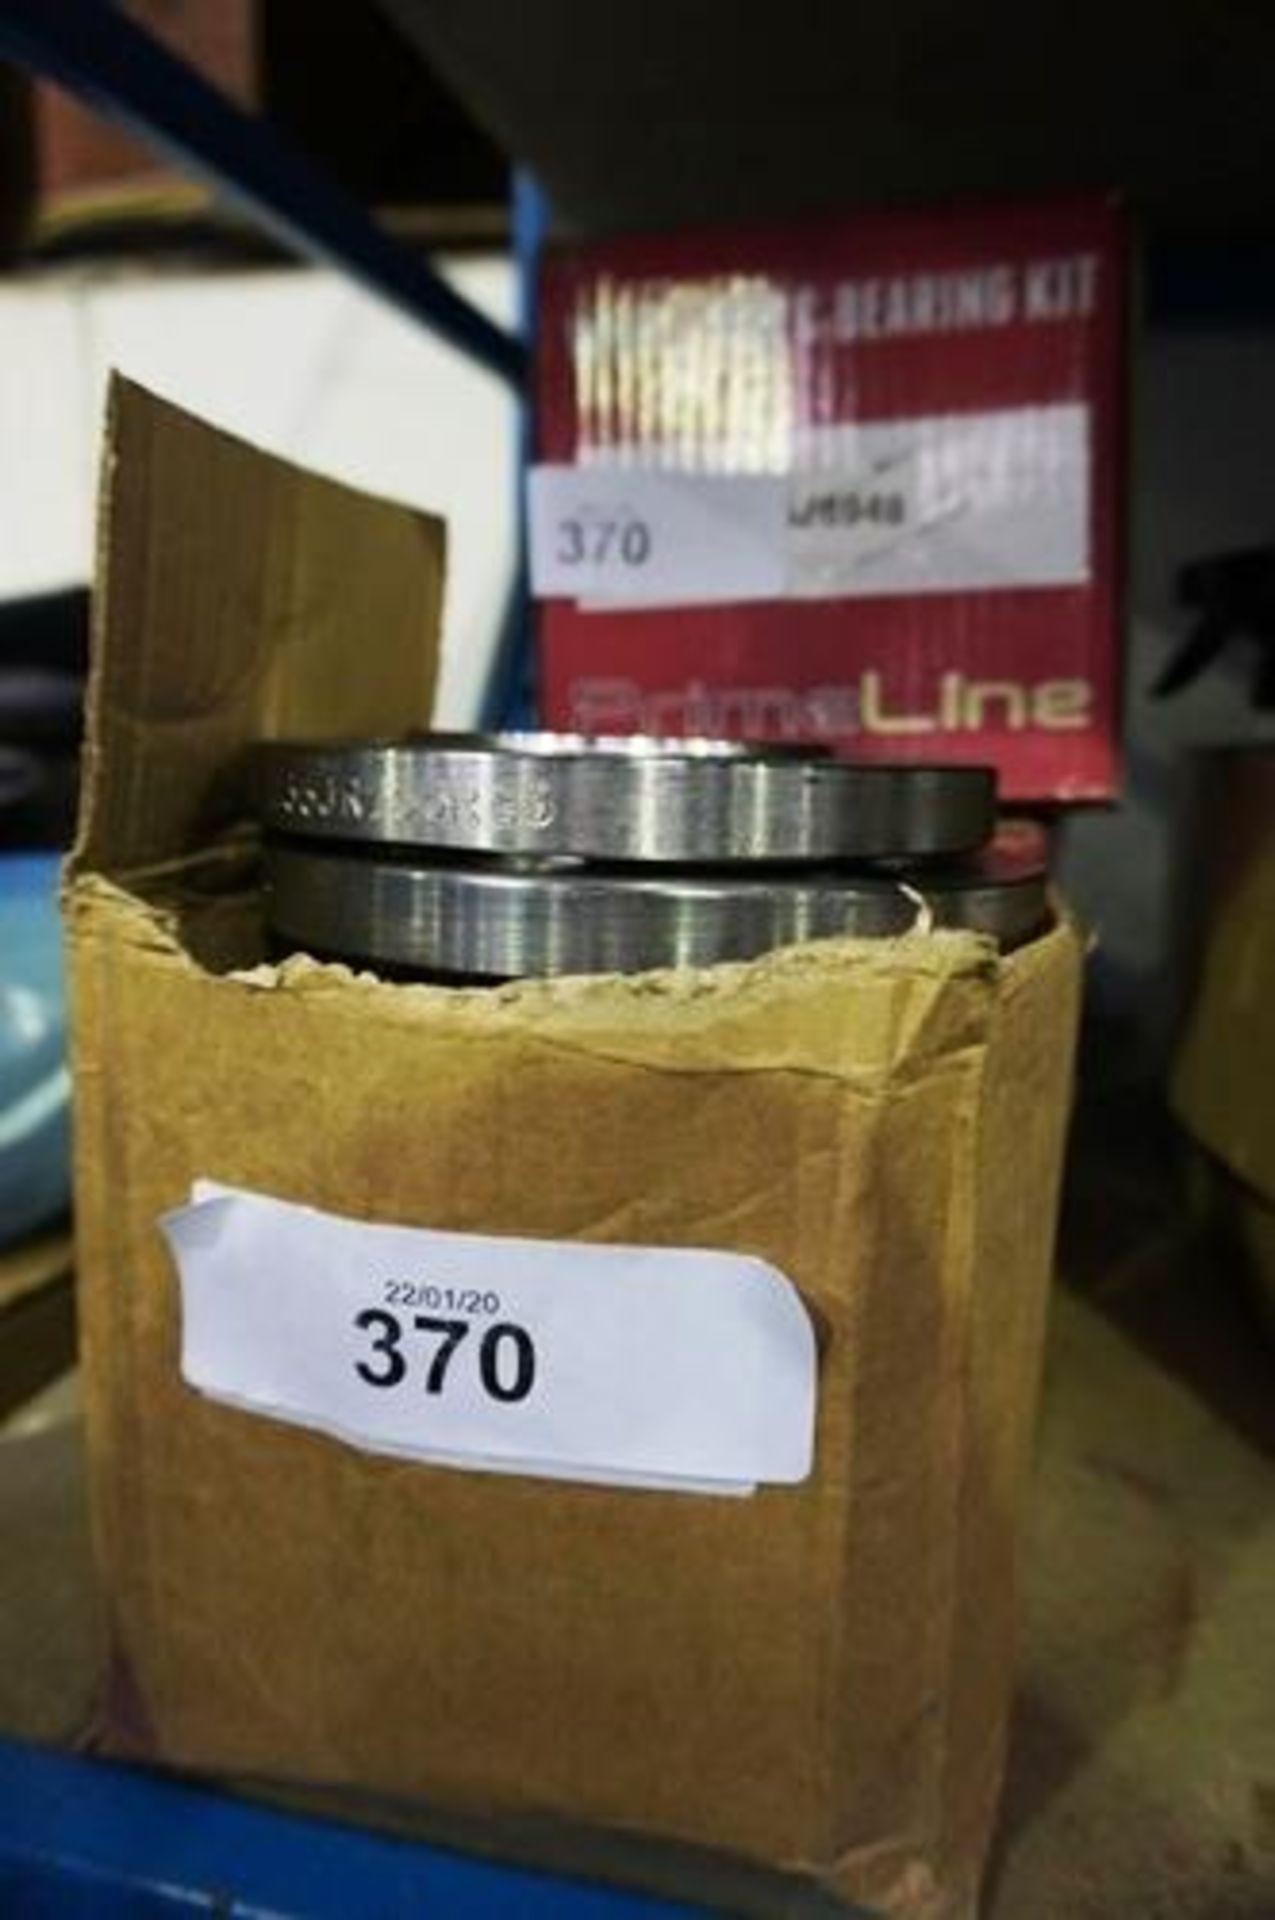 Lot 370 - 2 x Prime Line wheel hub and bearing kit, P.N. PLB26948 - New (GS11)